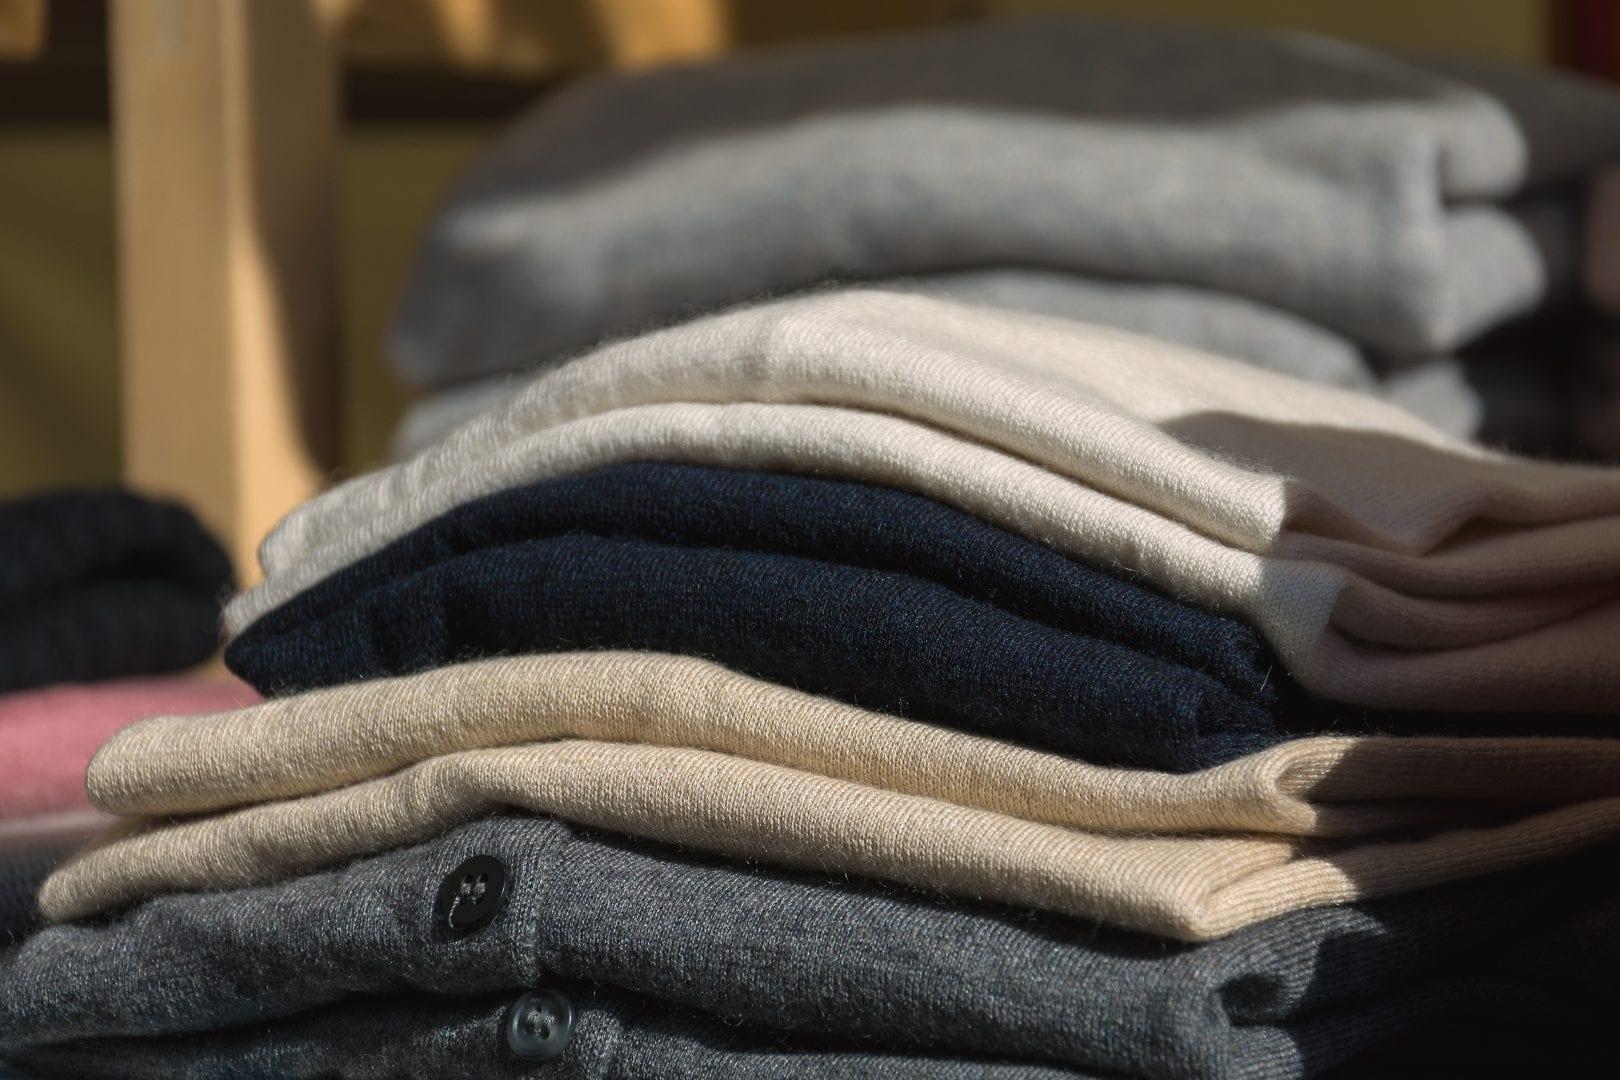 A pile of neatly folded clothing